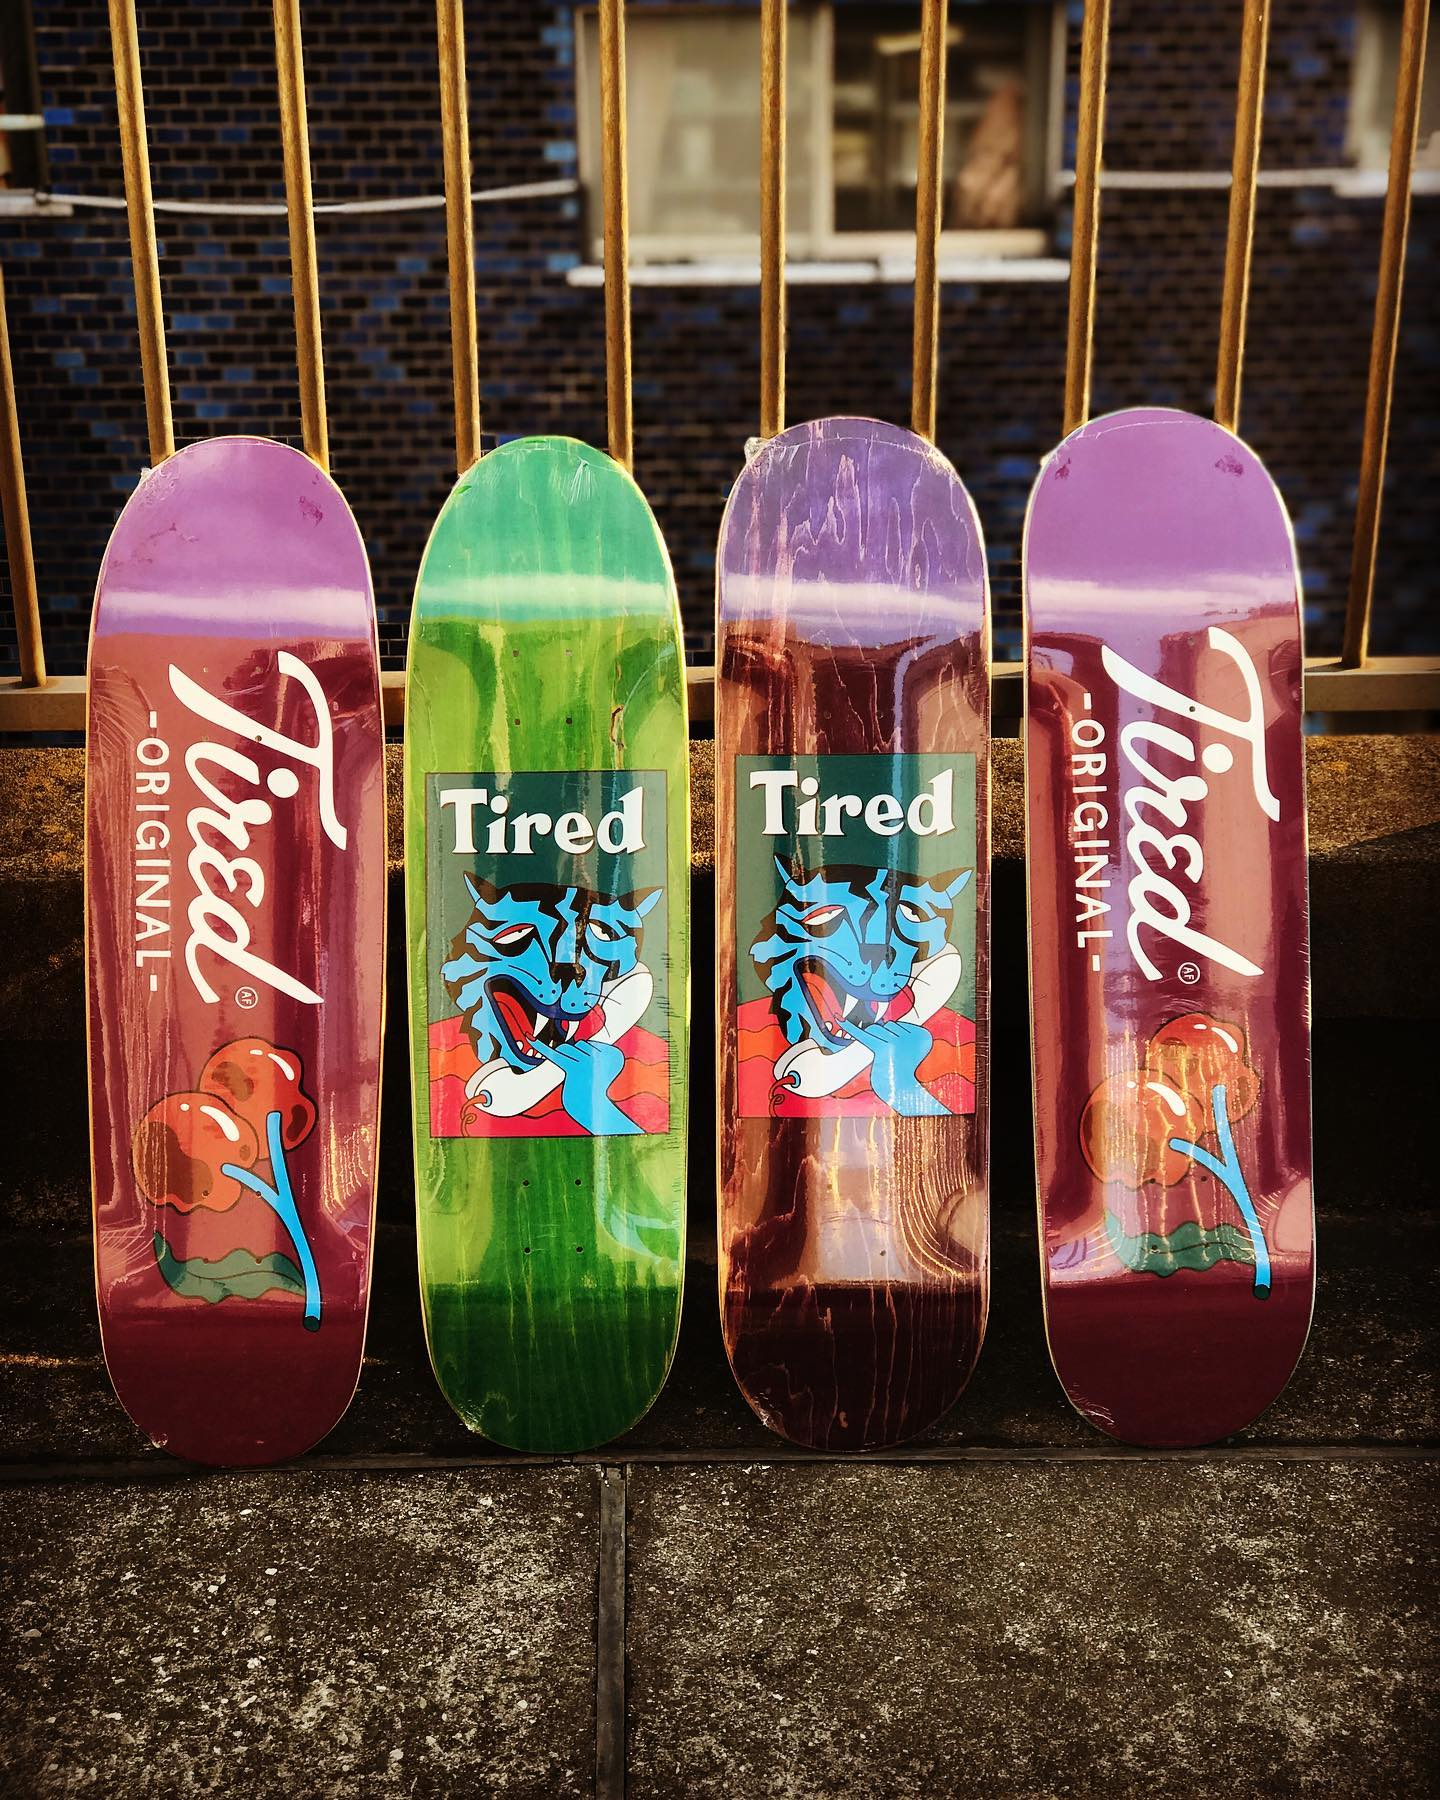 @tiredskateboards New @tiredskateboards decks.話題の東京2020のスケートボードユニフォームのデザインも手がけたアムステルダムのPARRAが立ち上げたスケートボードカンパニー。Tiredは以下のような人に向けて作られています。・オーリーをしただけで息が上がる人・1時間滑ると3日間筋肉痛になる人・警備員と同世代の人・プロにはなれないけどスケートが大好きな人オーリーしただけで息が上がる、1時間滑ると3日間筋肉痛になる、それでもスケートを愛してやまないオヤジスケーターの為のスケートカンパニーTired。